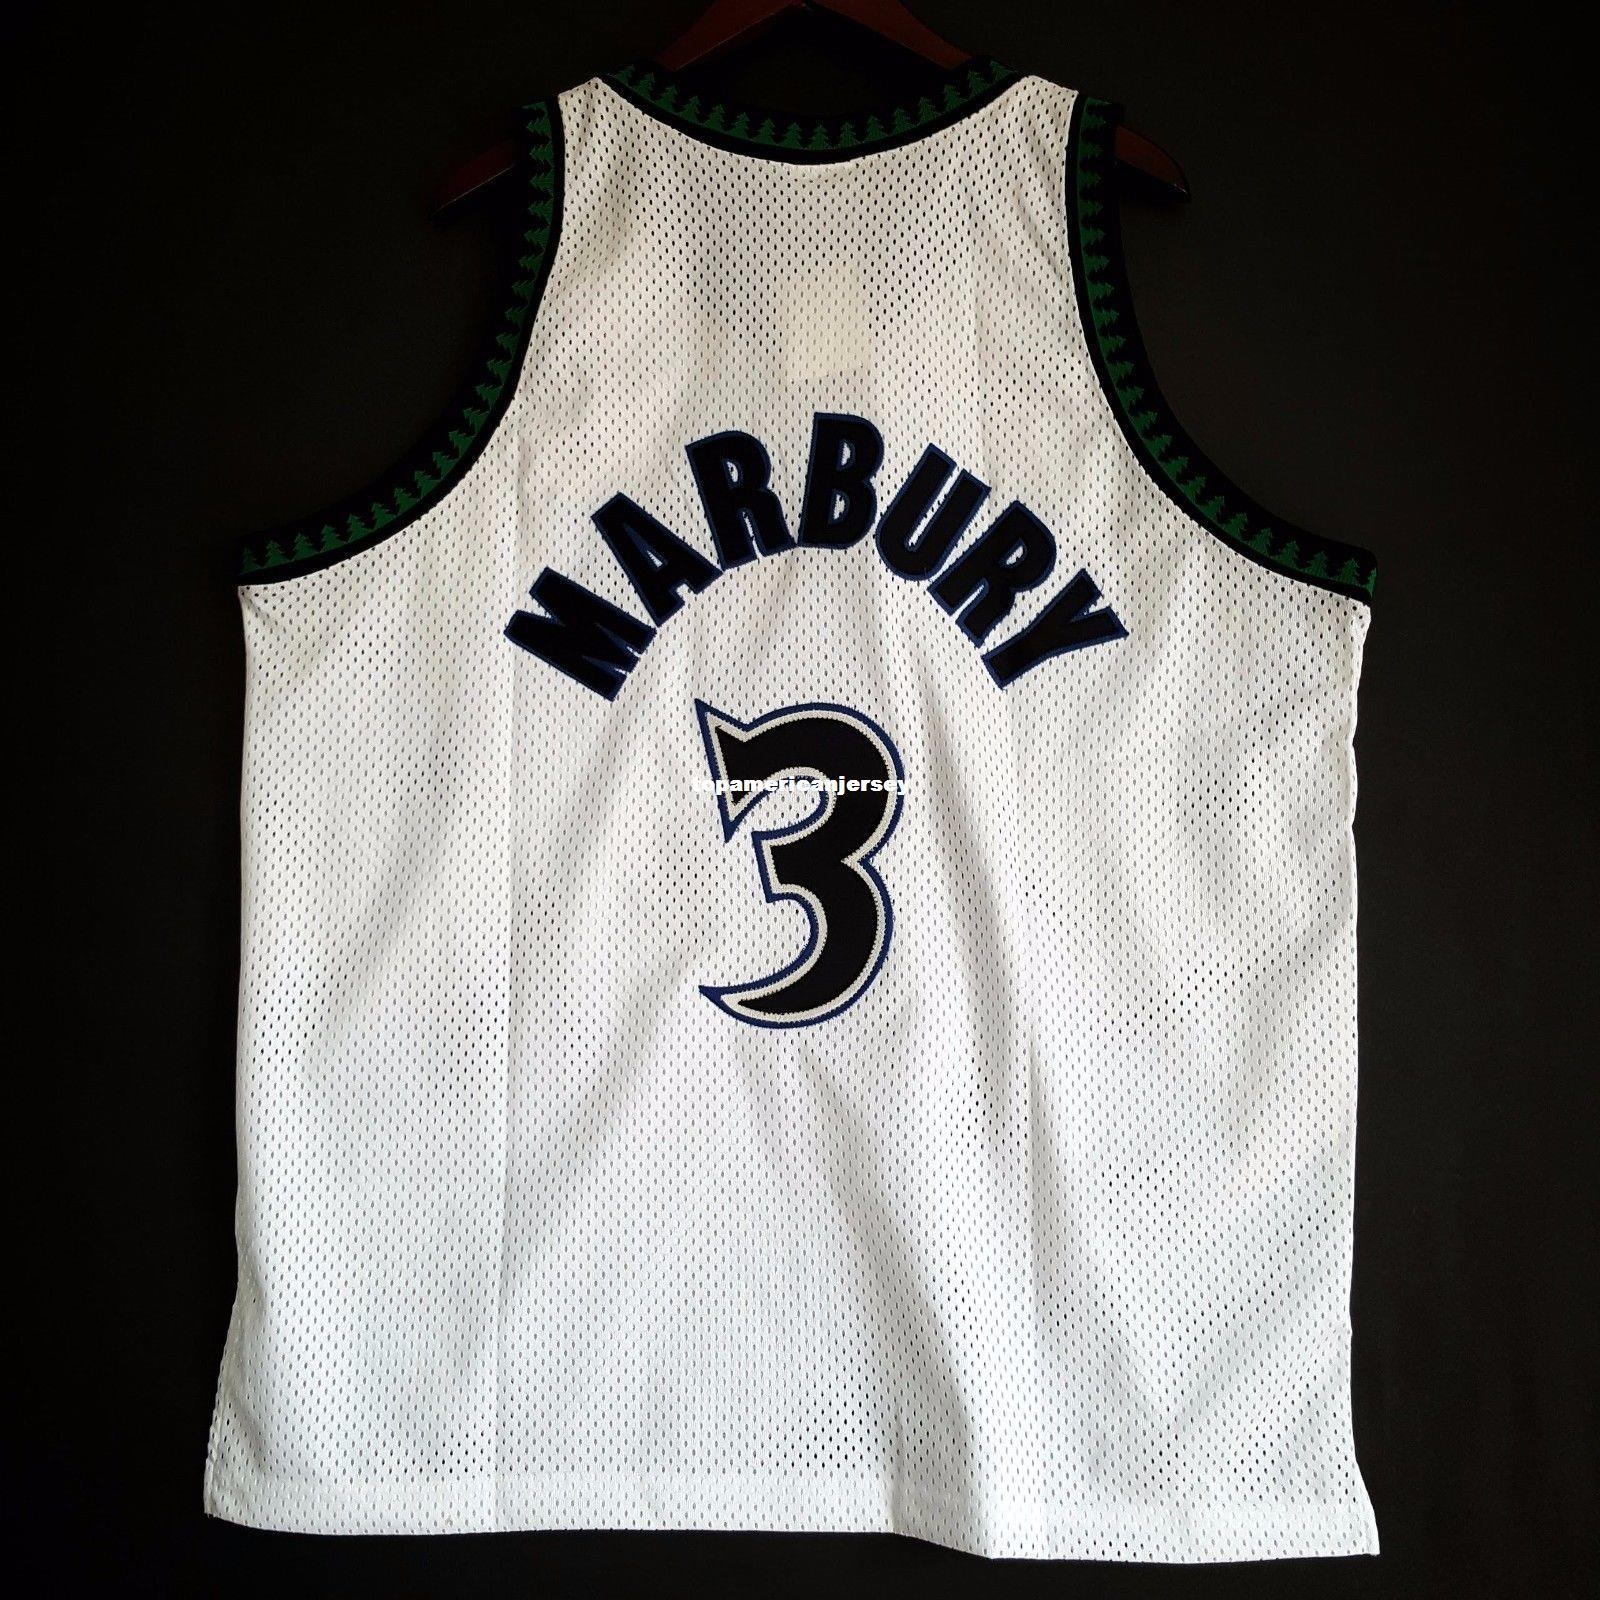 100% genäht Stephon Marbury # 3 Starter genäht Jersey weiß Herren Weste Größe XS-6XL genäht Basketball Trikots Ncaa